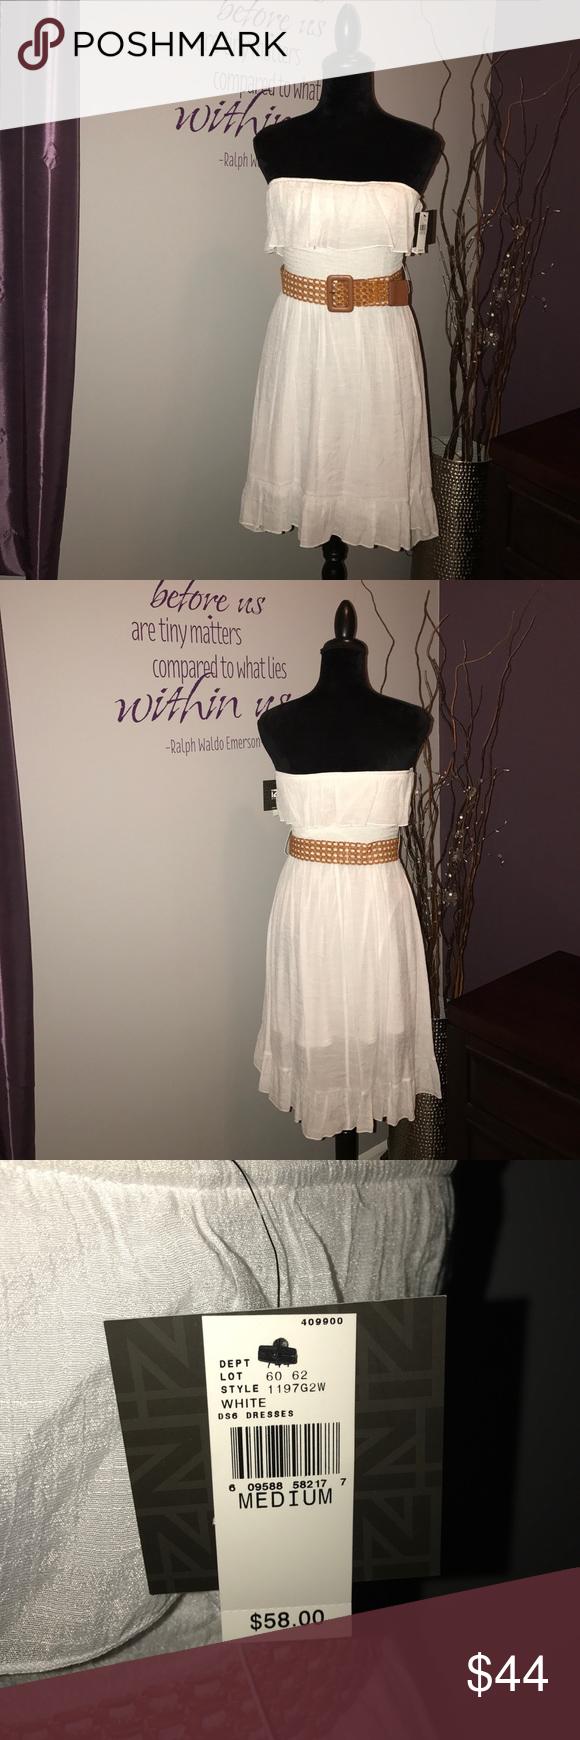 Price drop white summer dress w belt nwt white summer dresses